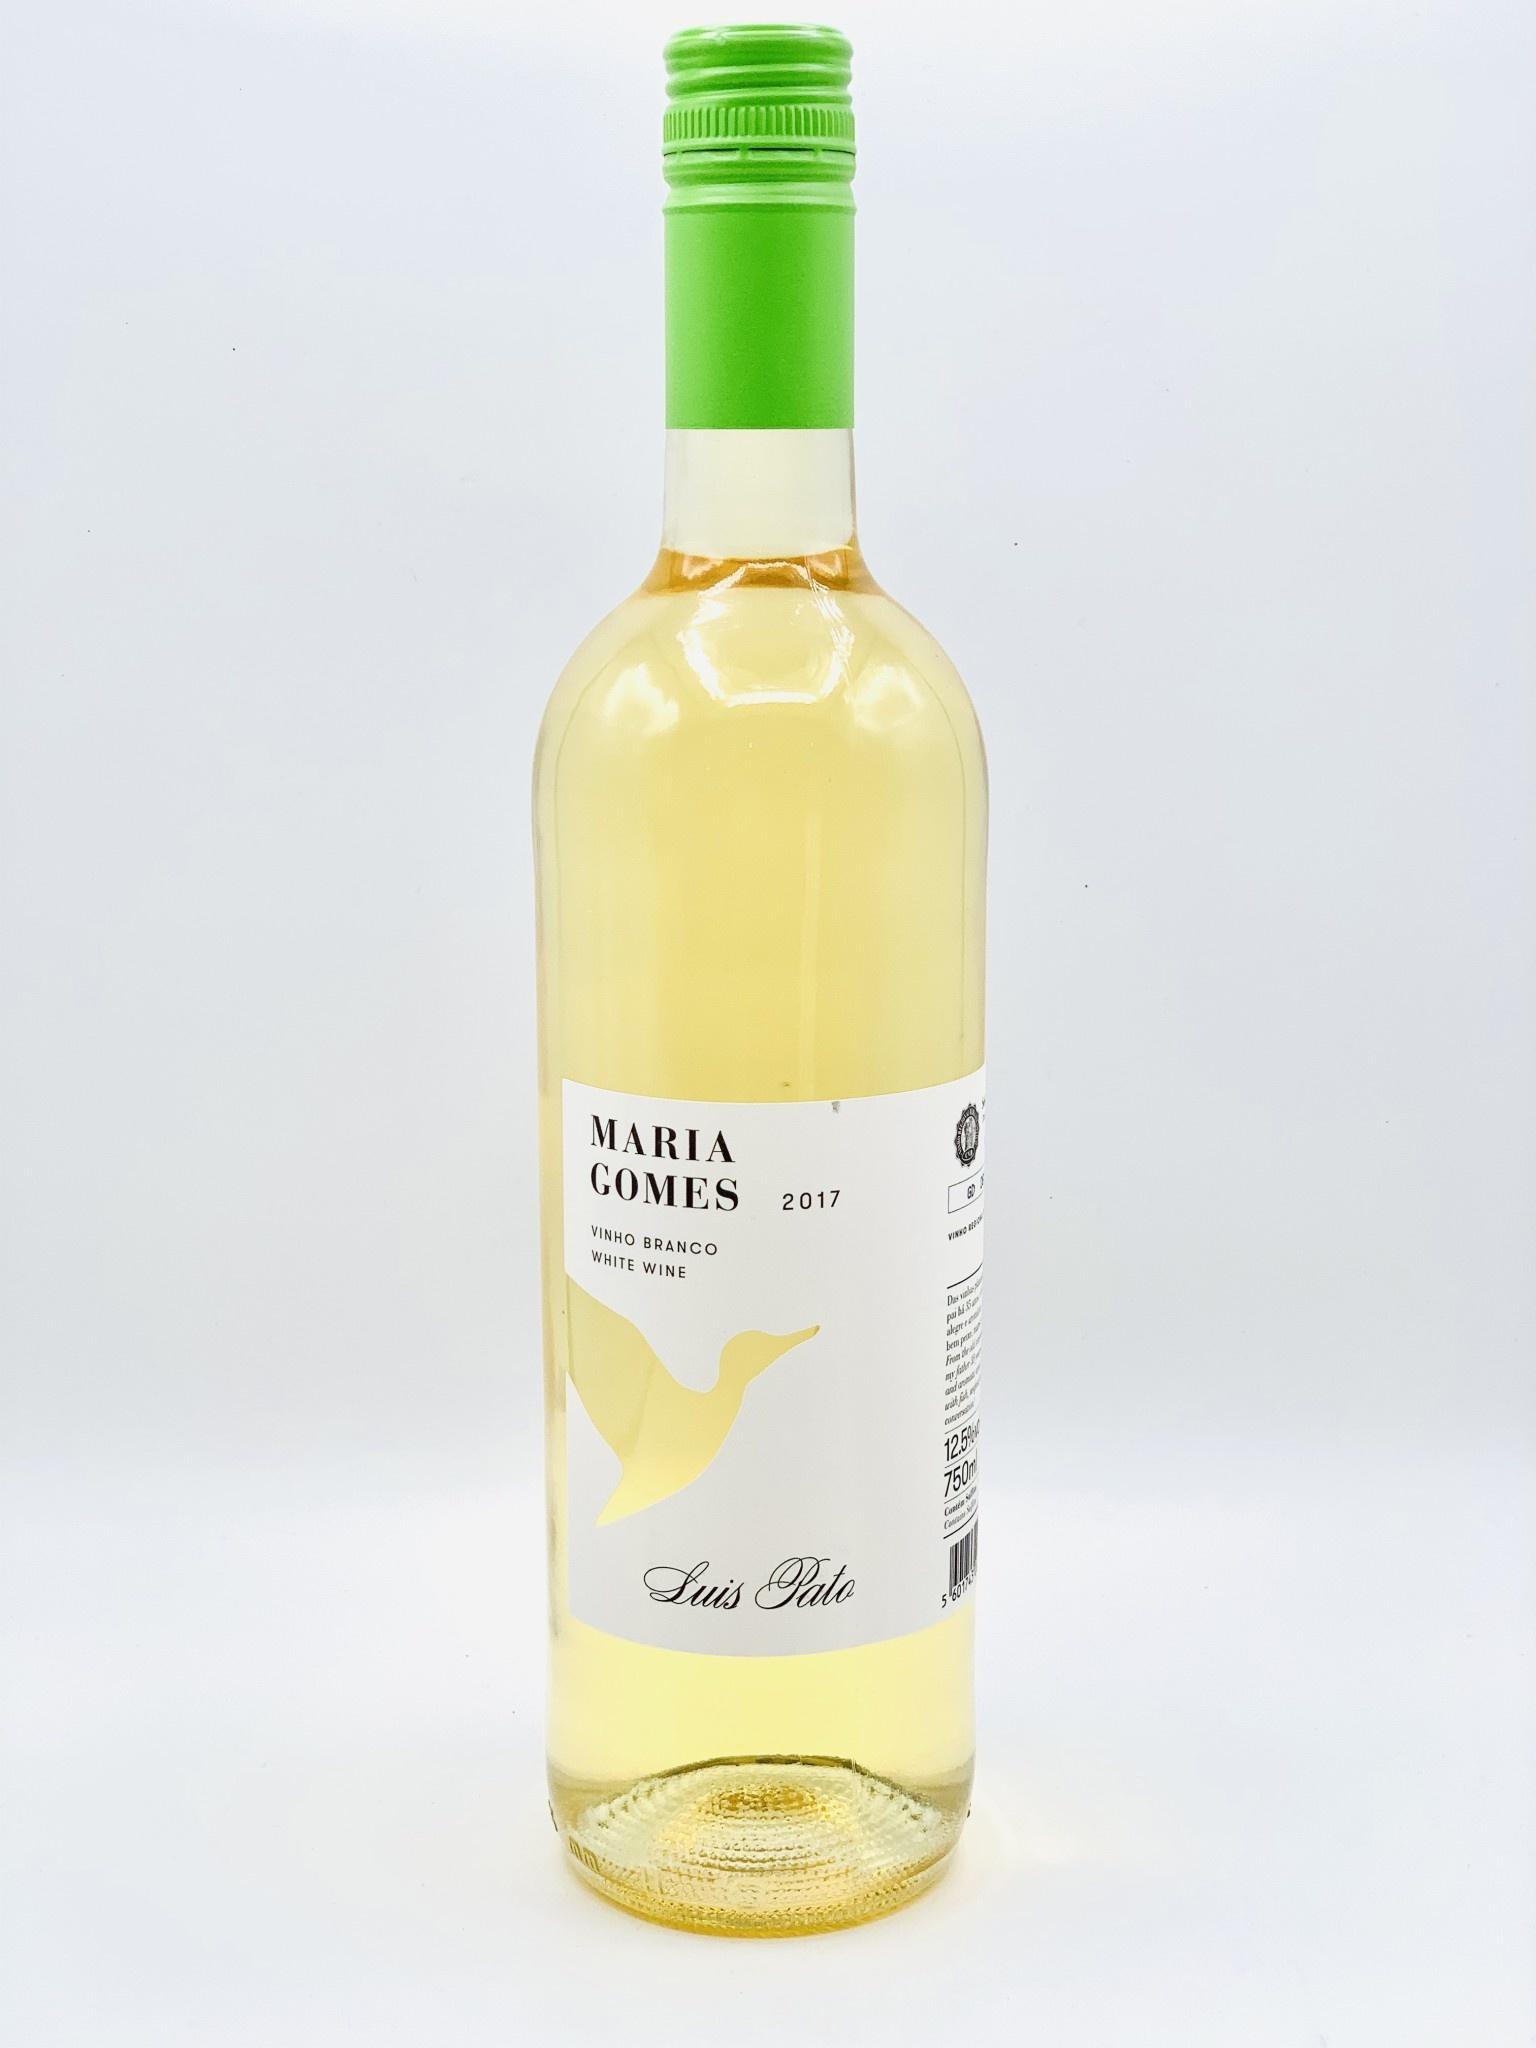 Portugal Vinho White 2017 Luis Pato (Maria Gomes) 750ml